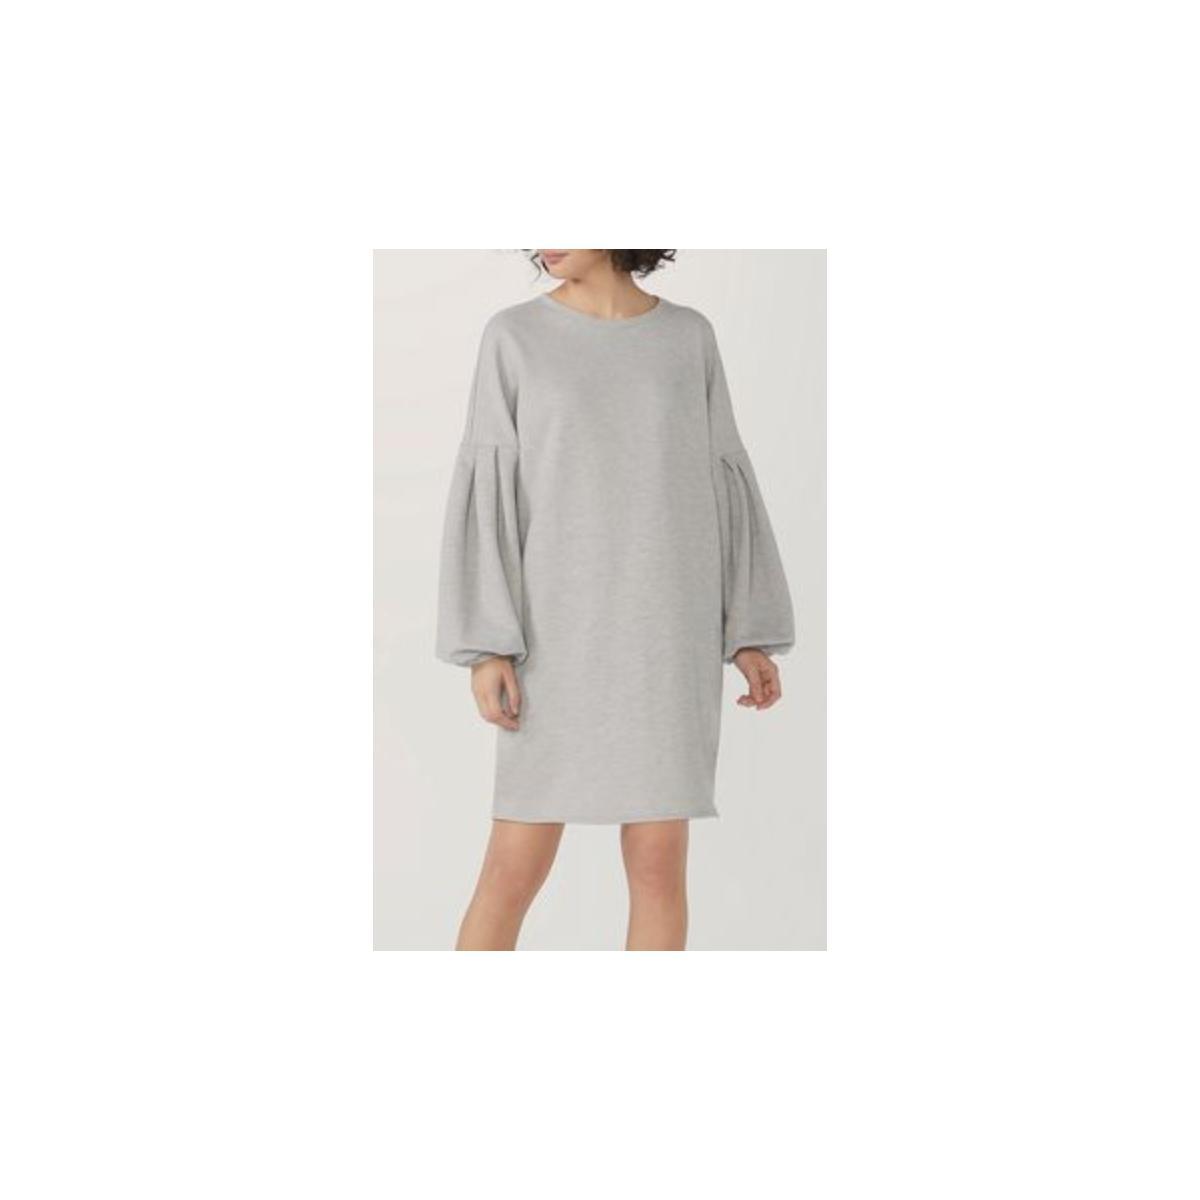 Vestido Feminino Hering Kids 5ax0 M2hen  Mescla